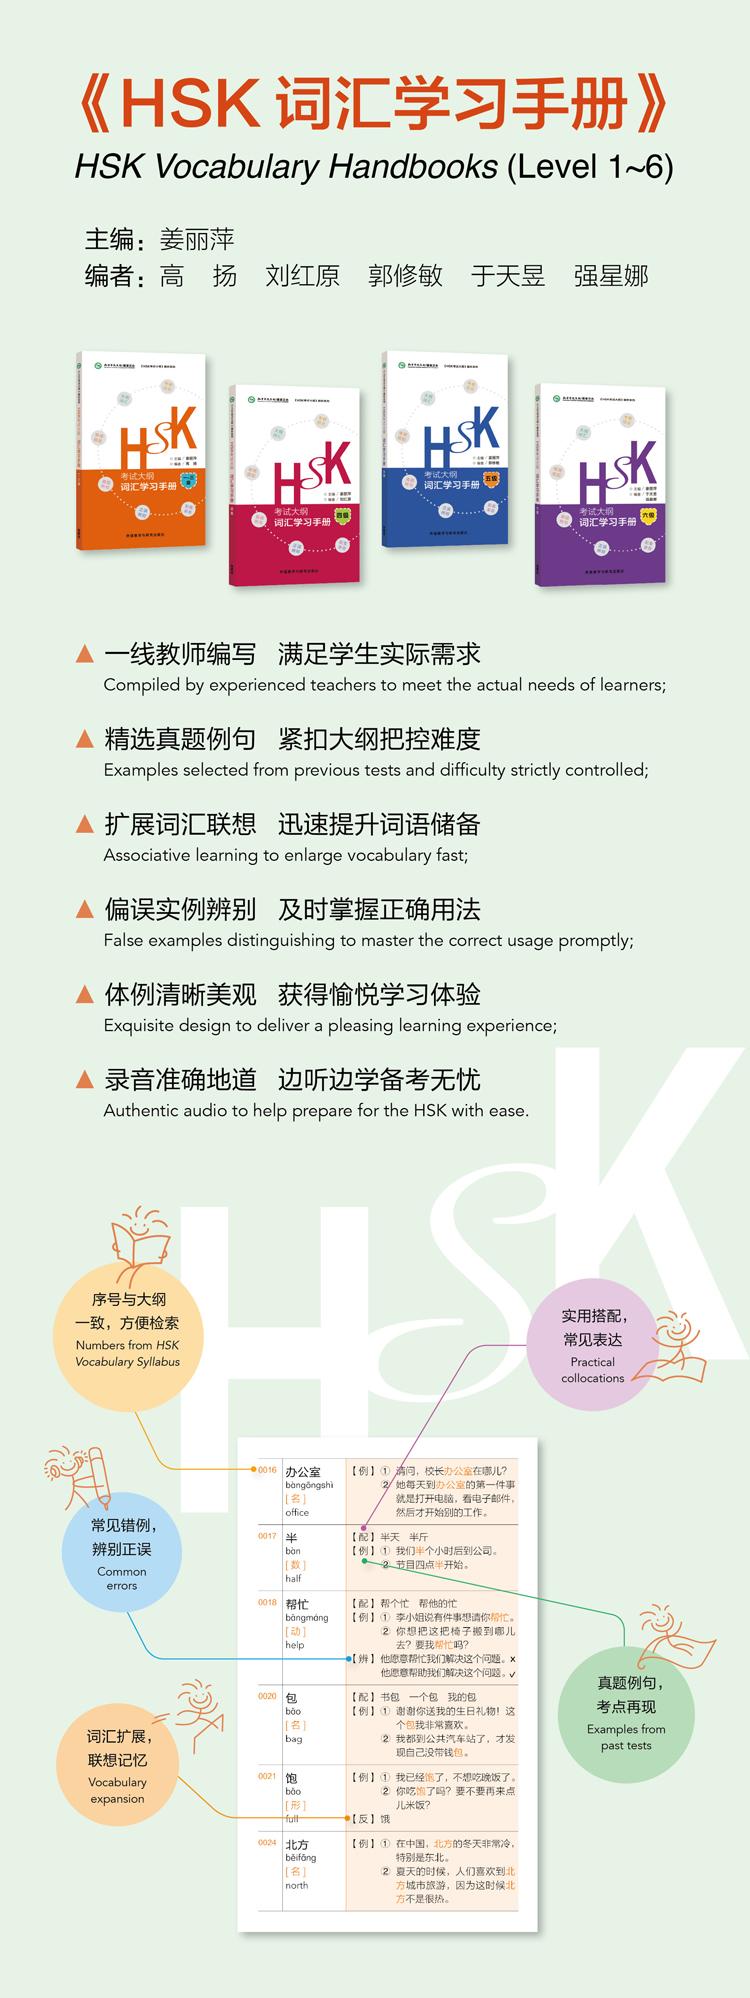 HSK考試大綱 詞匯学習手冊六級-《HSK考試大綱》解析系列